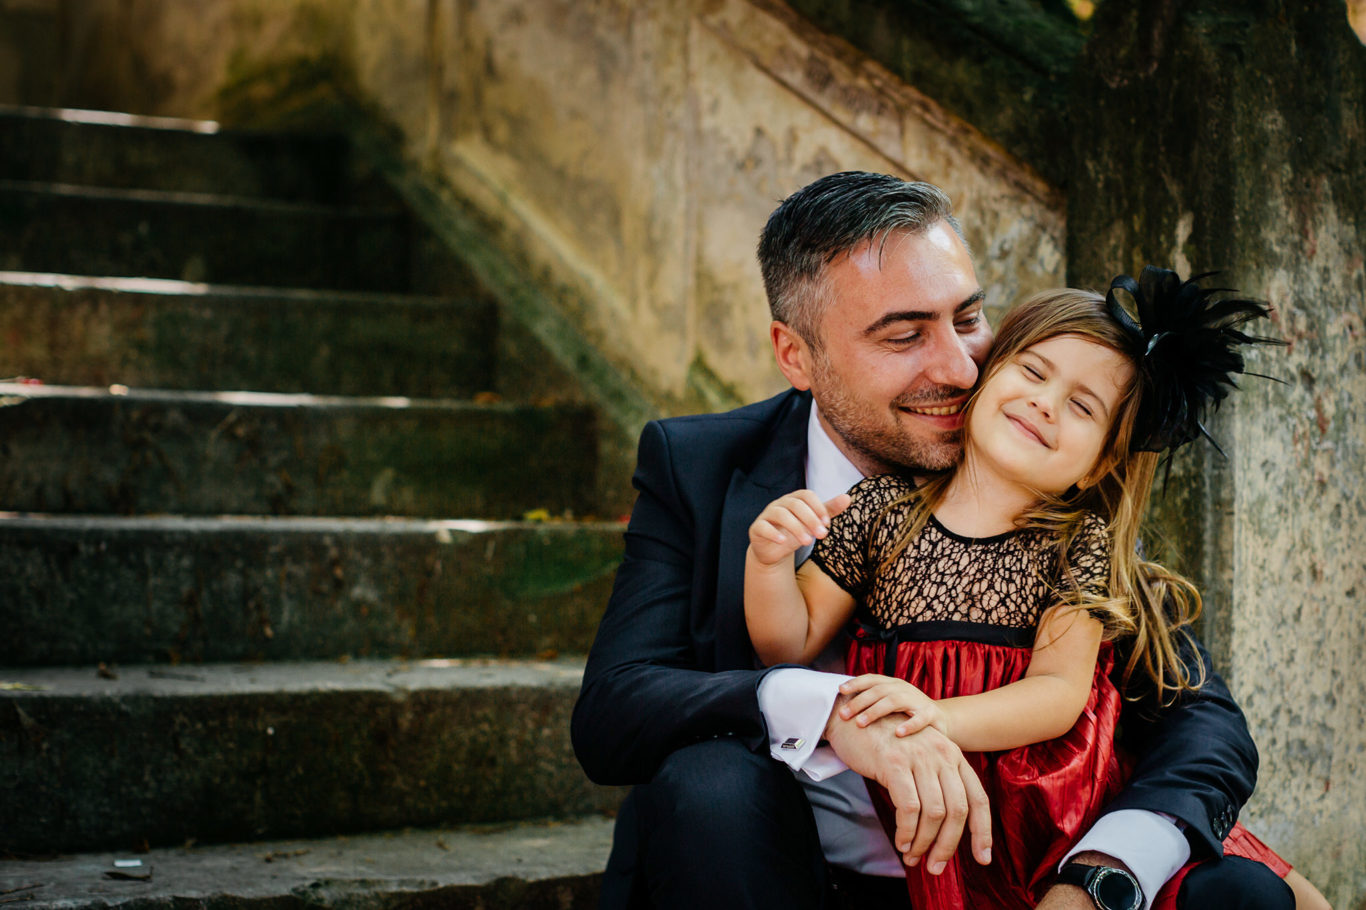 0310-fotografie-nunta-bucuresti-anca-george-fotograf-ciprian-dumitrescu-dcf_4594